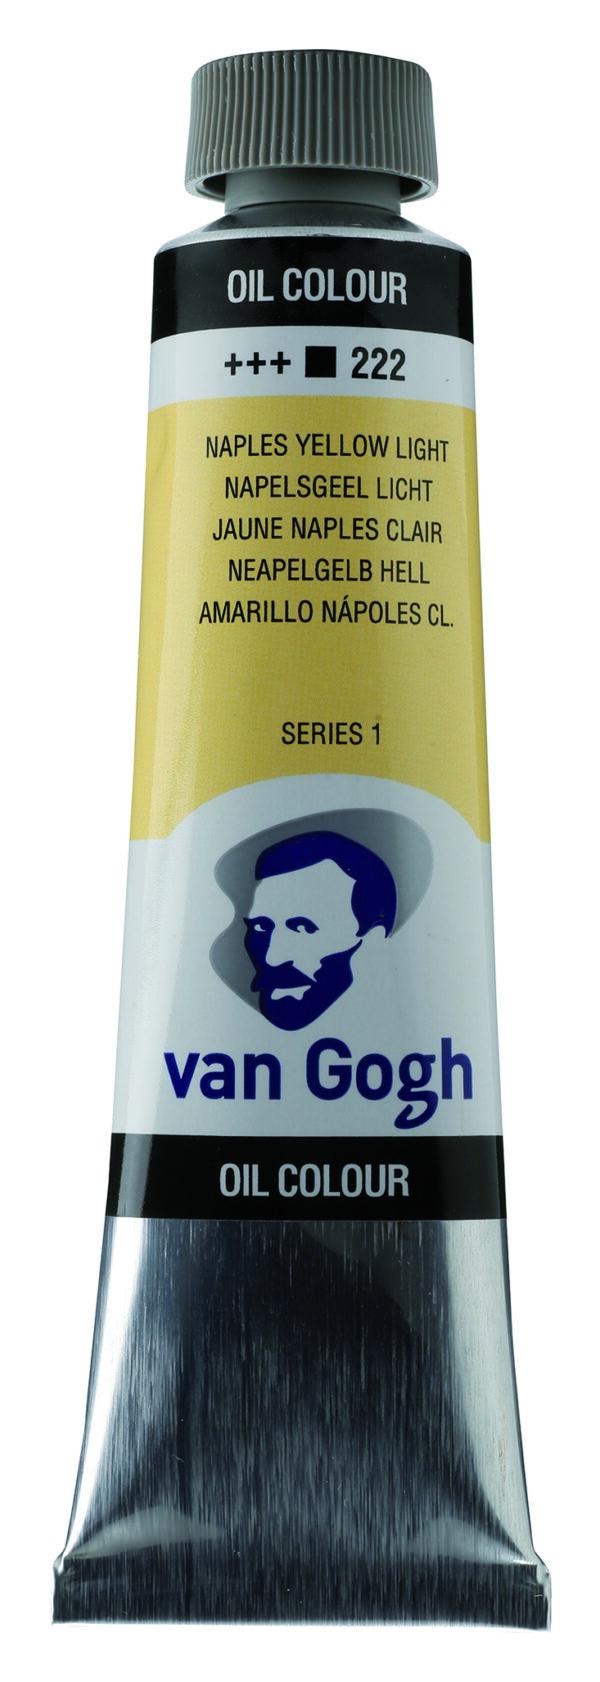 Van Gogh 222 Naples yellow Light - 40 ml